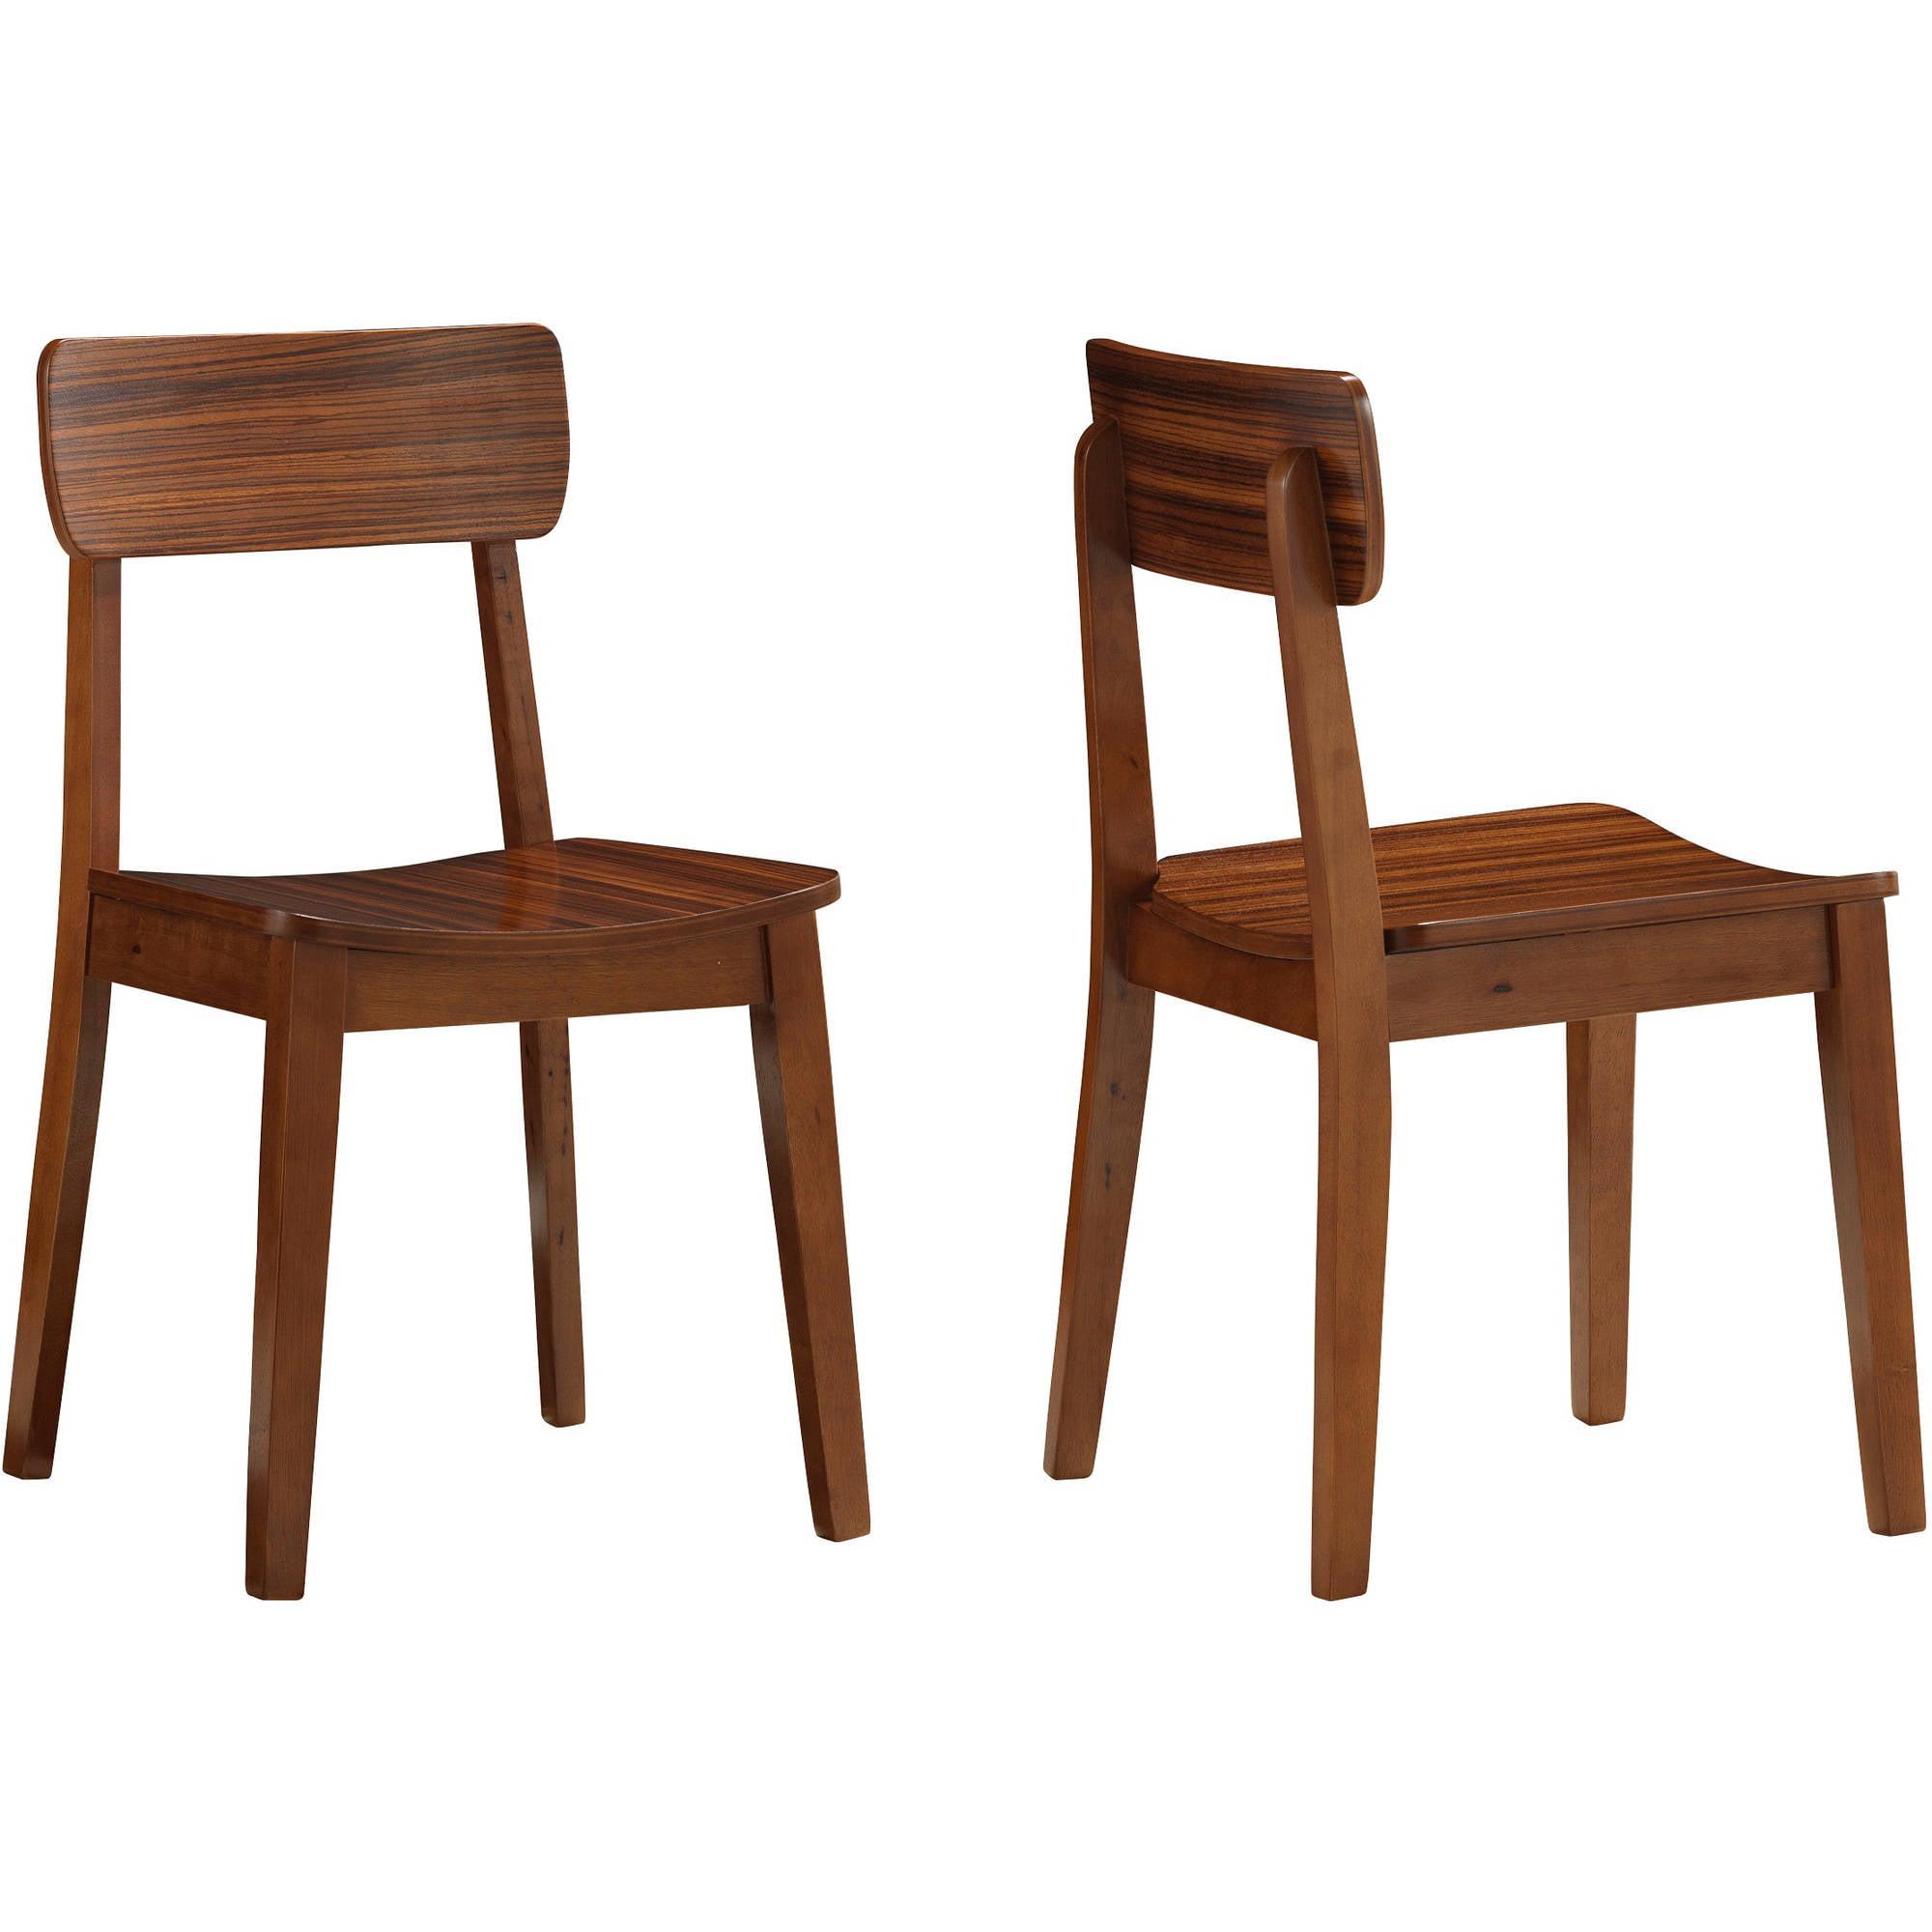 Boraam Zebra Series Hagen Dining Chairs, Set of 2, Walnut